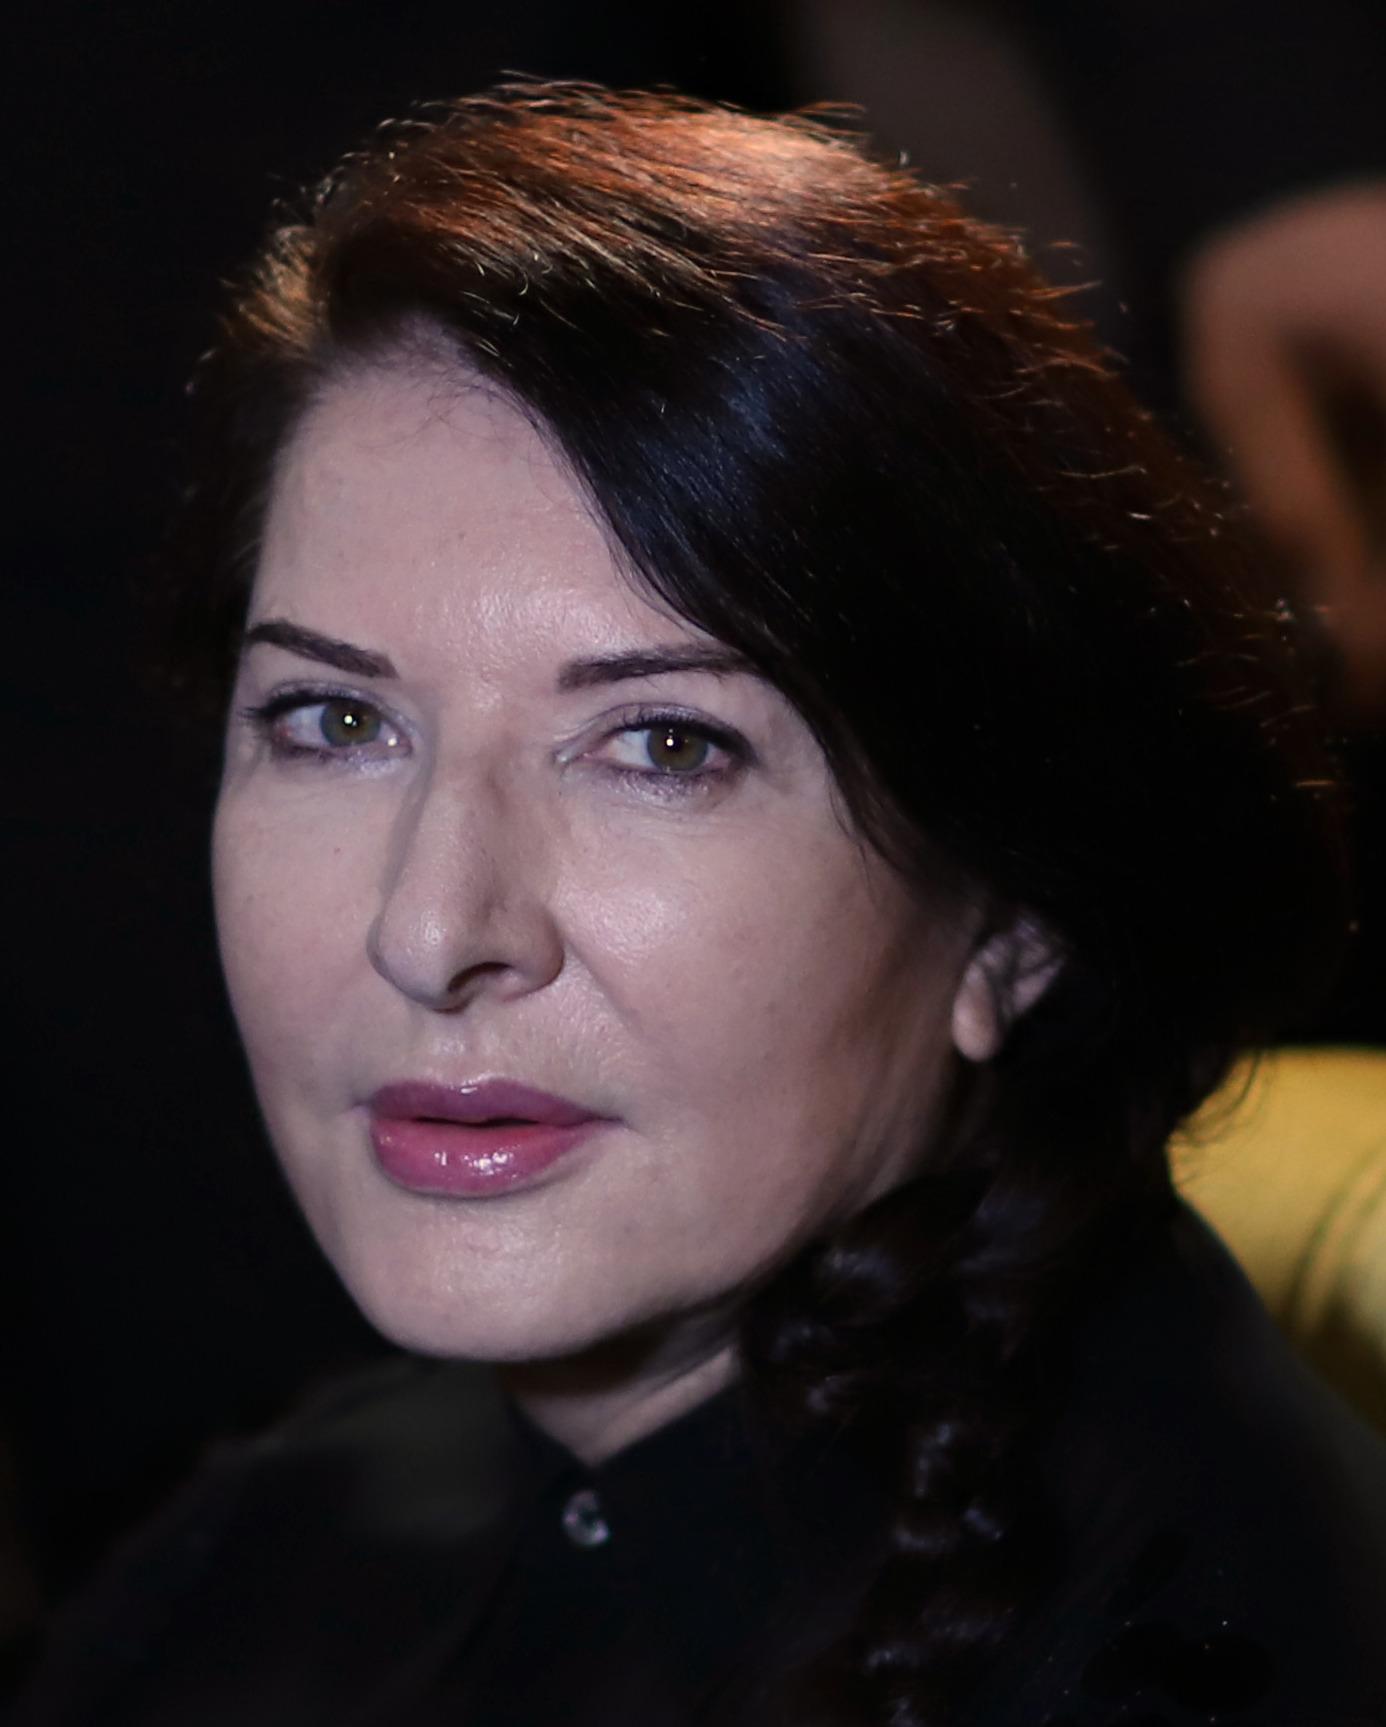 Marina Abramović - The Cleaner - [[Palazzo Strozzi]], [[Florence]] - 19 Sep 2018